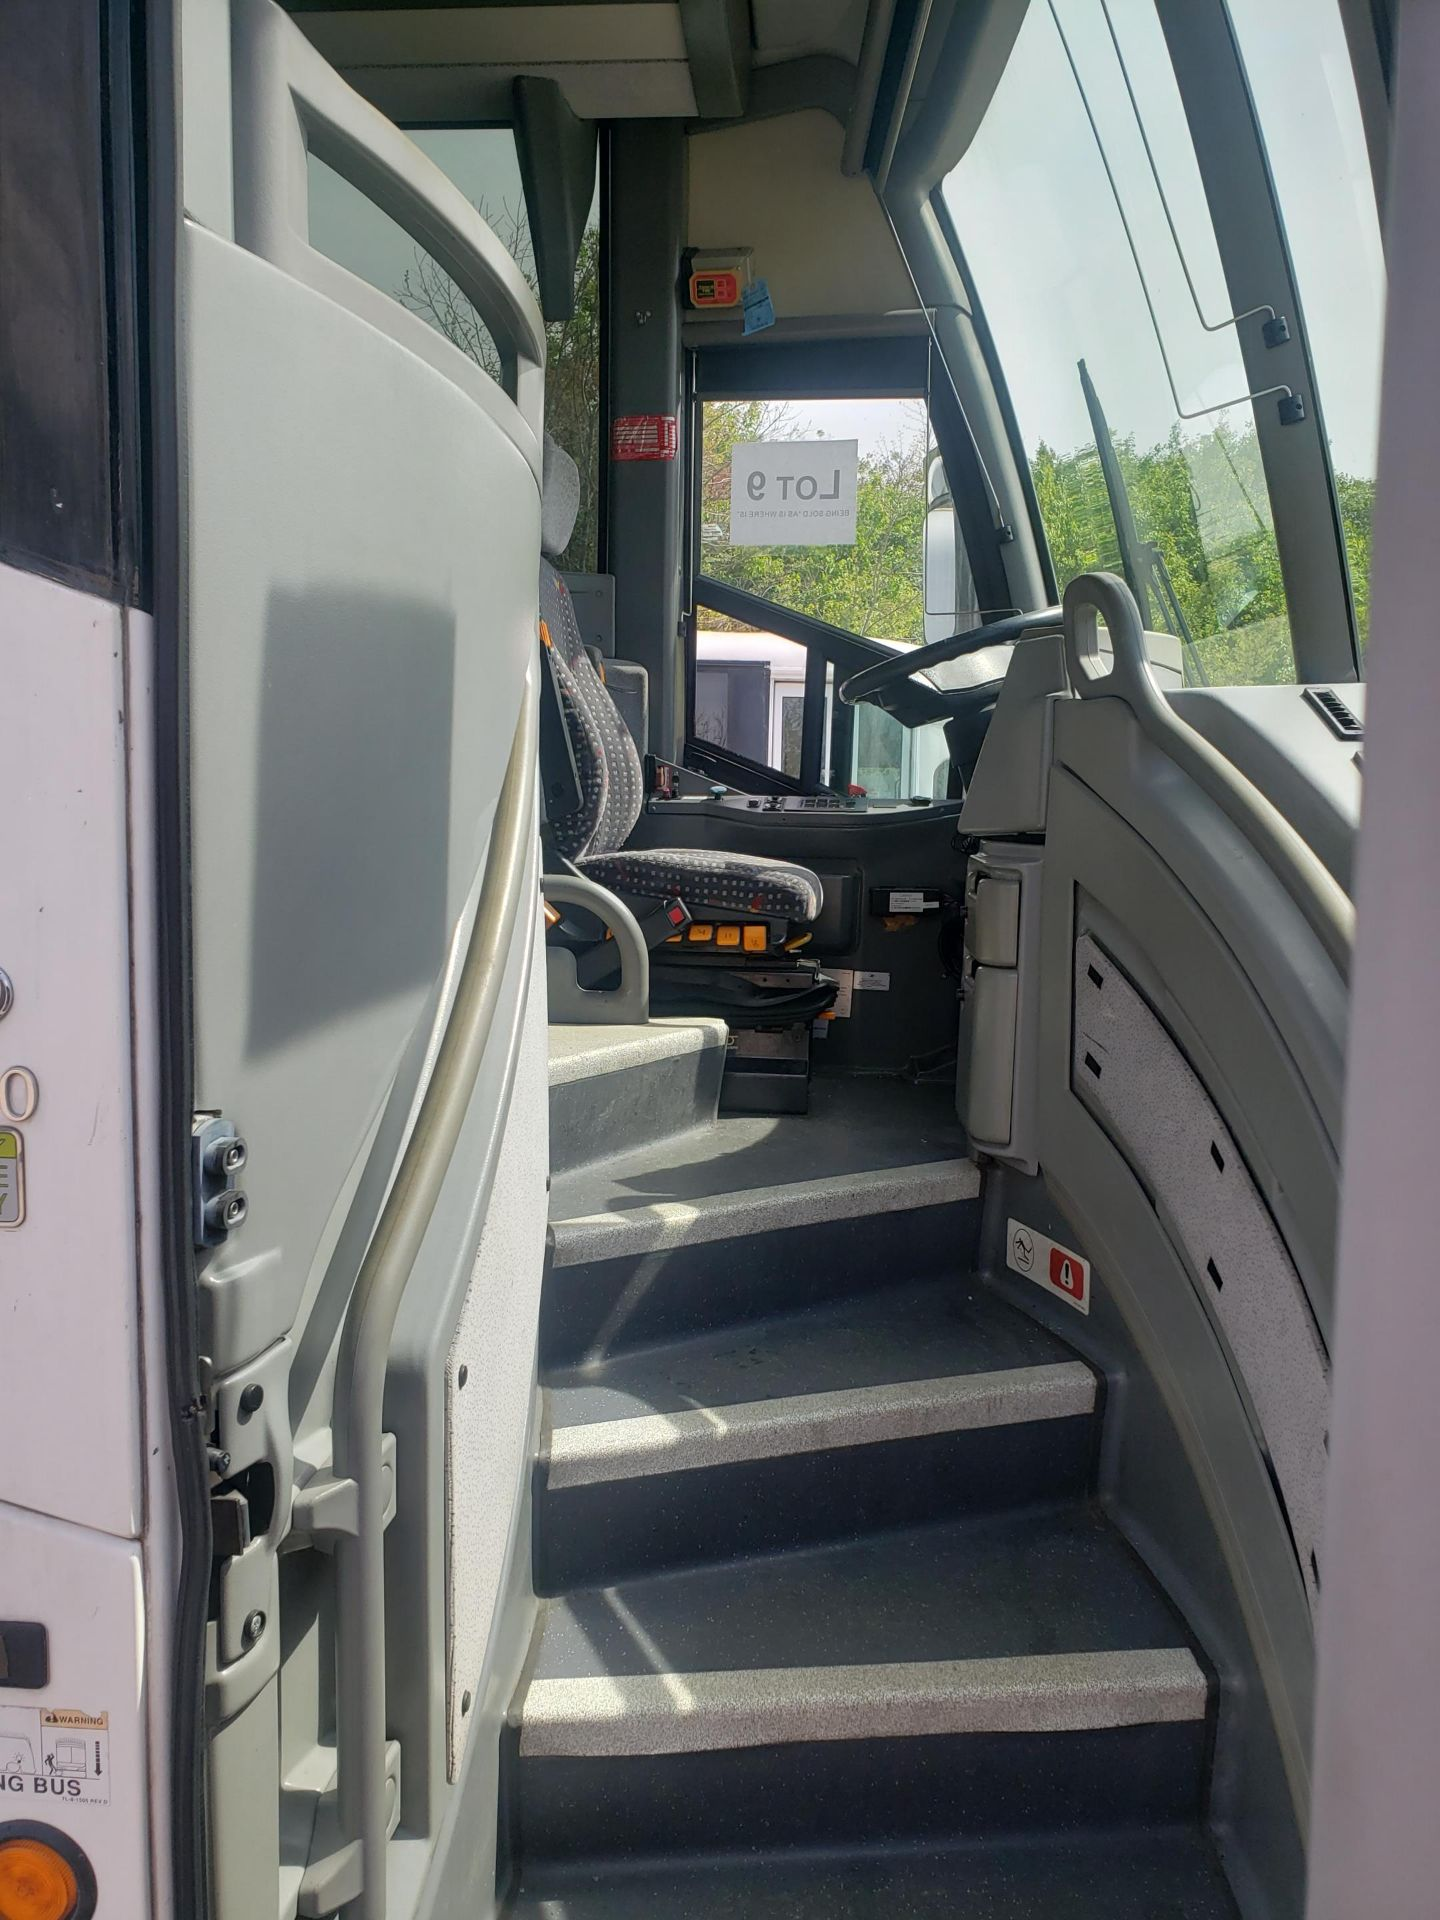 2010 MCI J4500 56-Pass Kneeling Coach Bus - Image 3 of 16